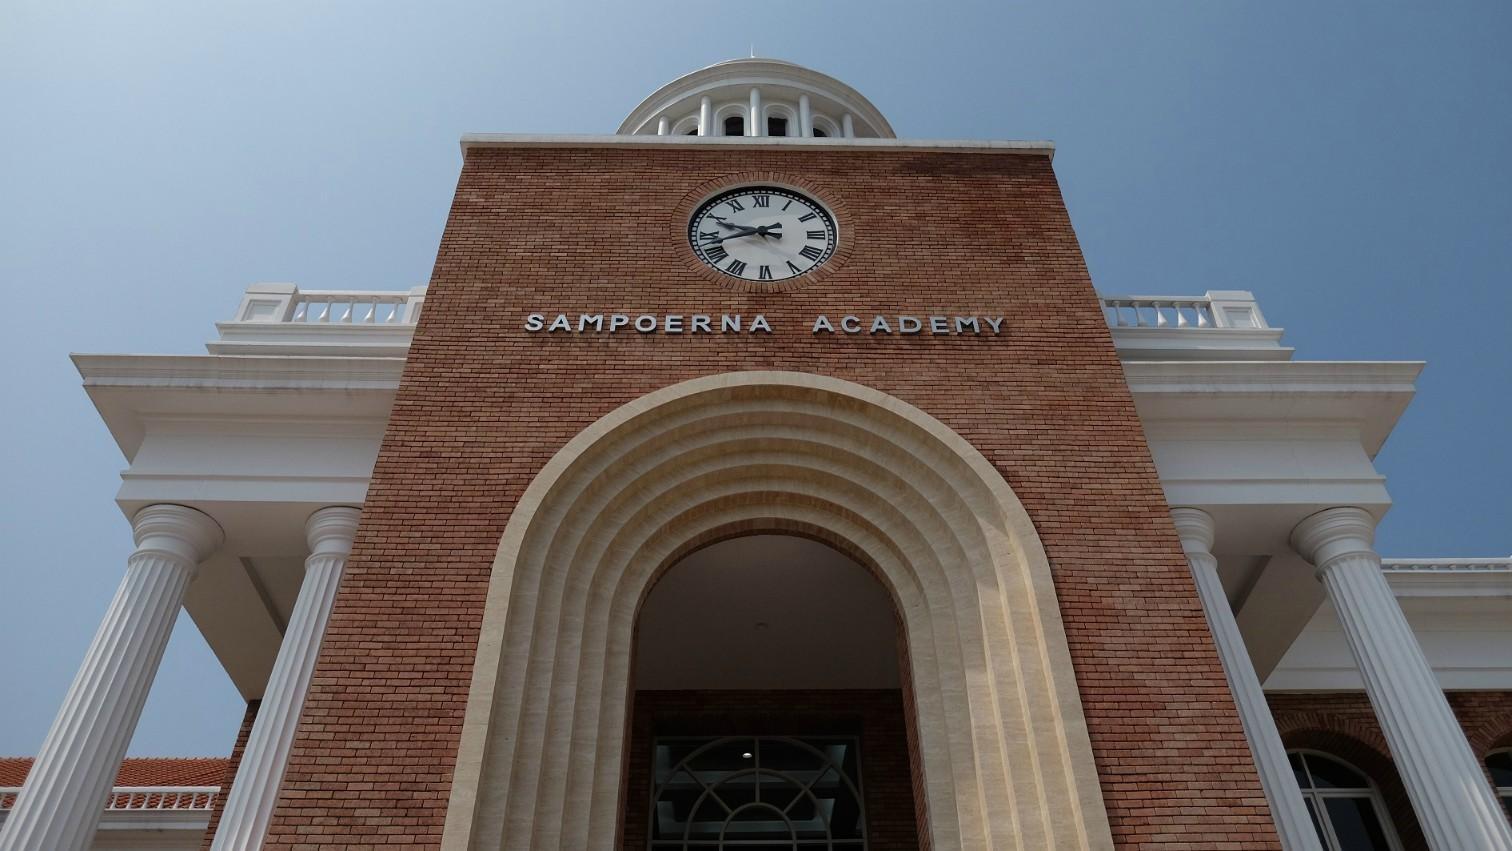 Sampoerna Academy Sentul cover